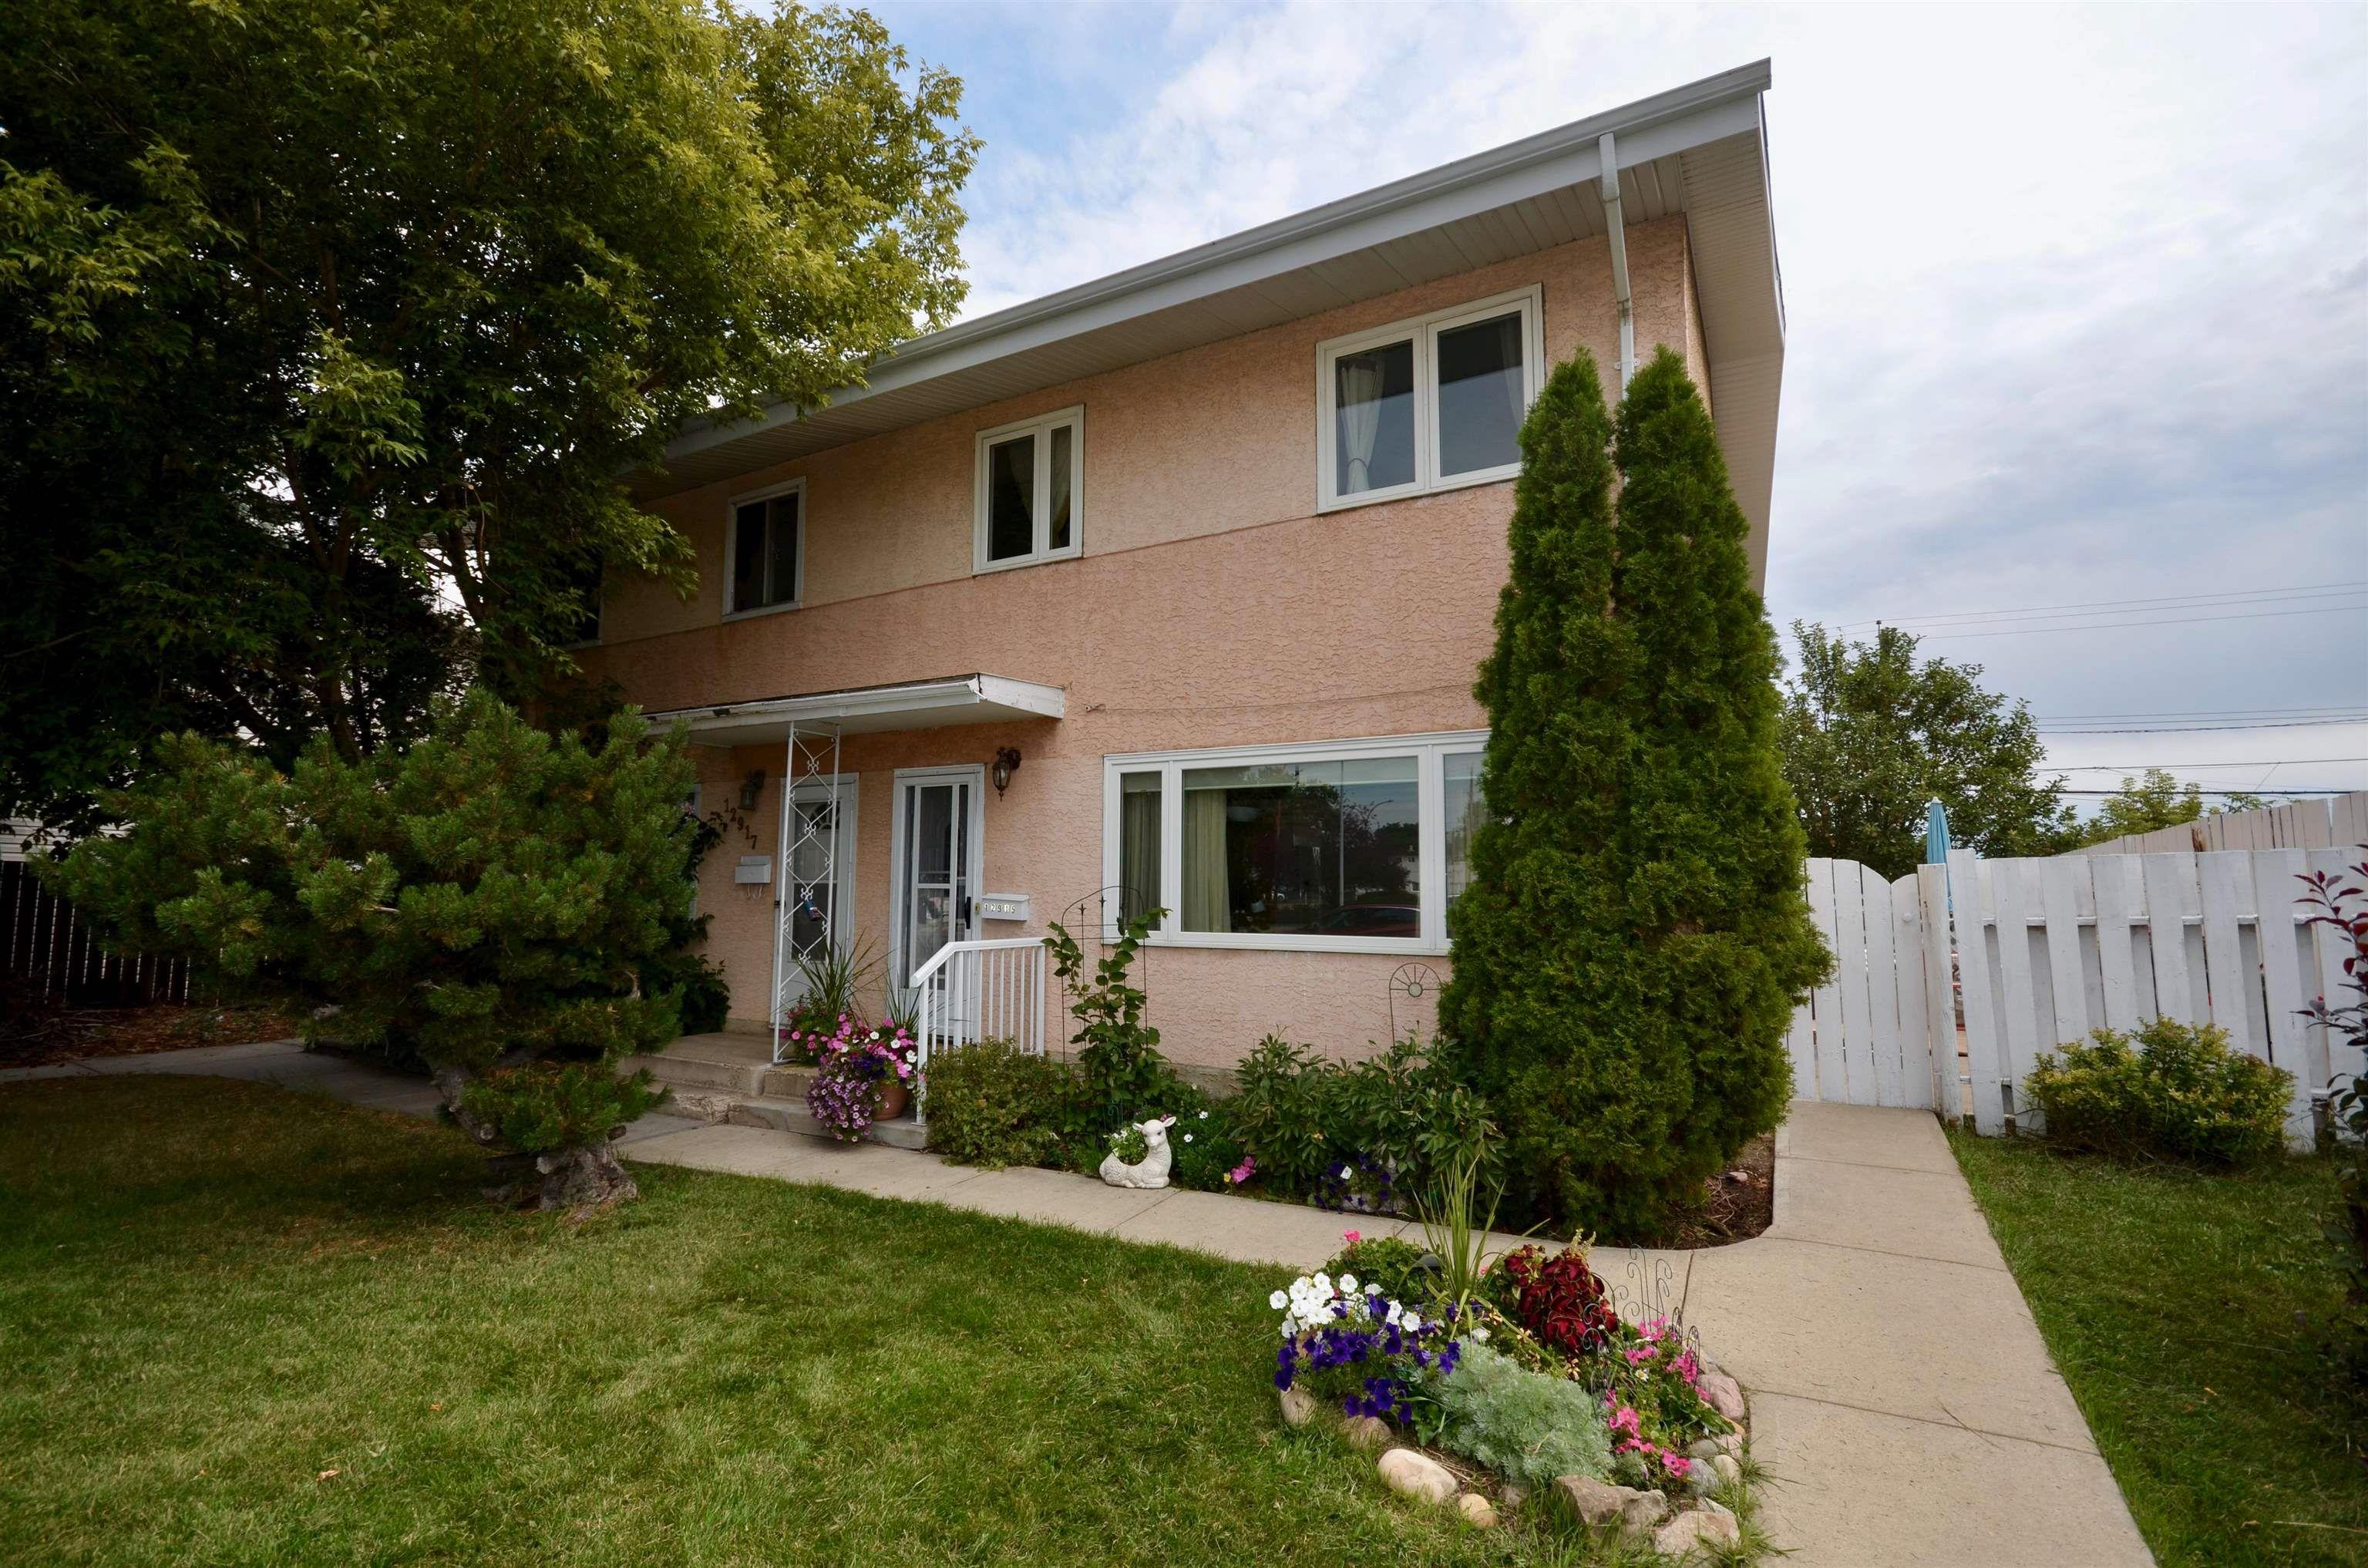 Main Photo: 12915 82 Street in Edmonton: Zone 02 House Half Duplex for sale : MLS®# E4260618